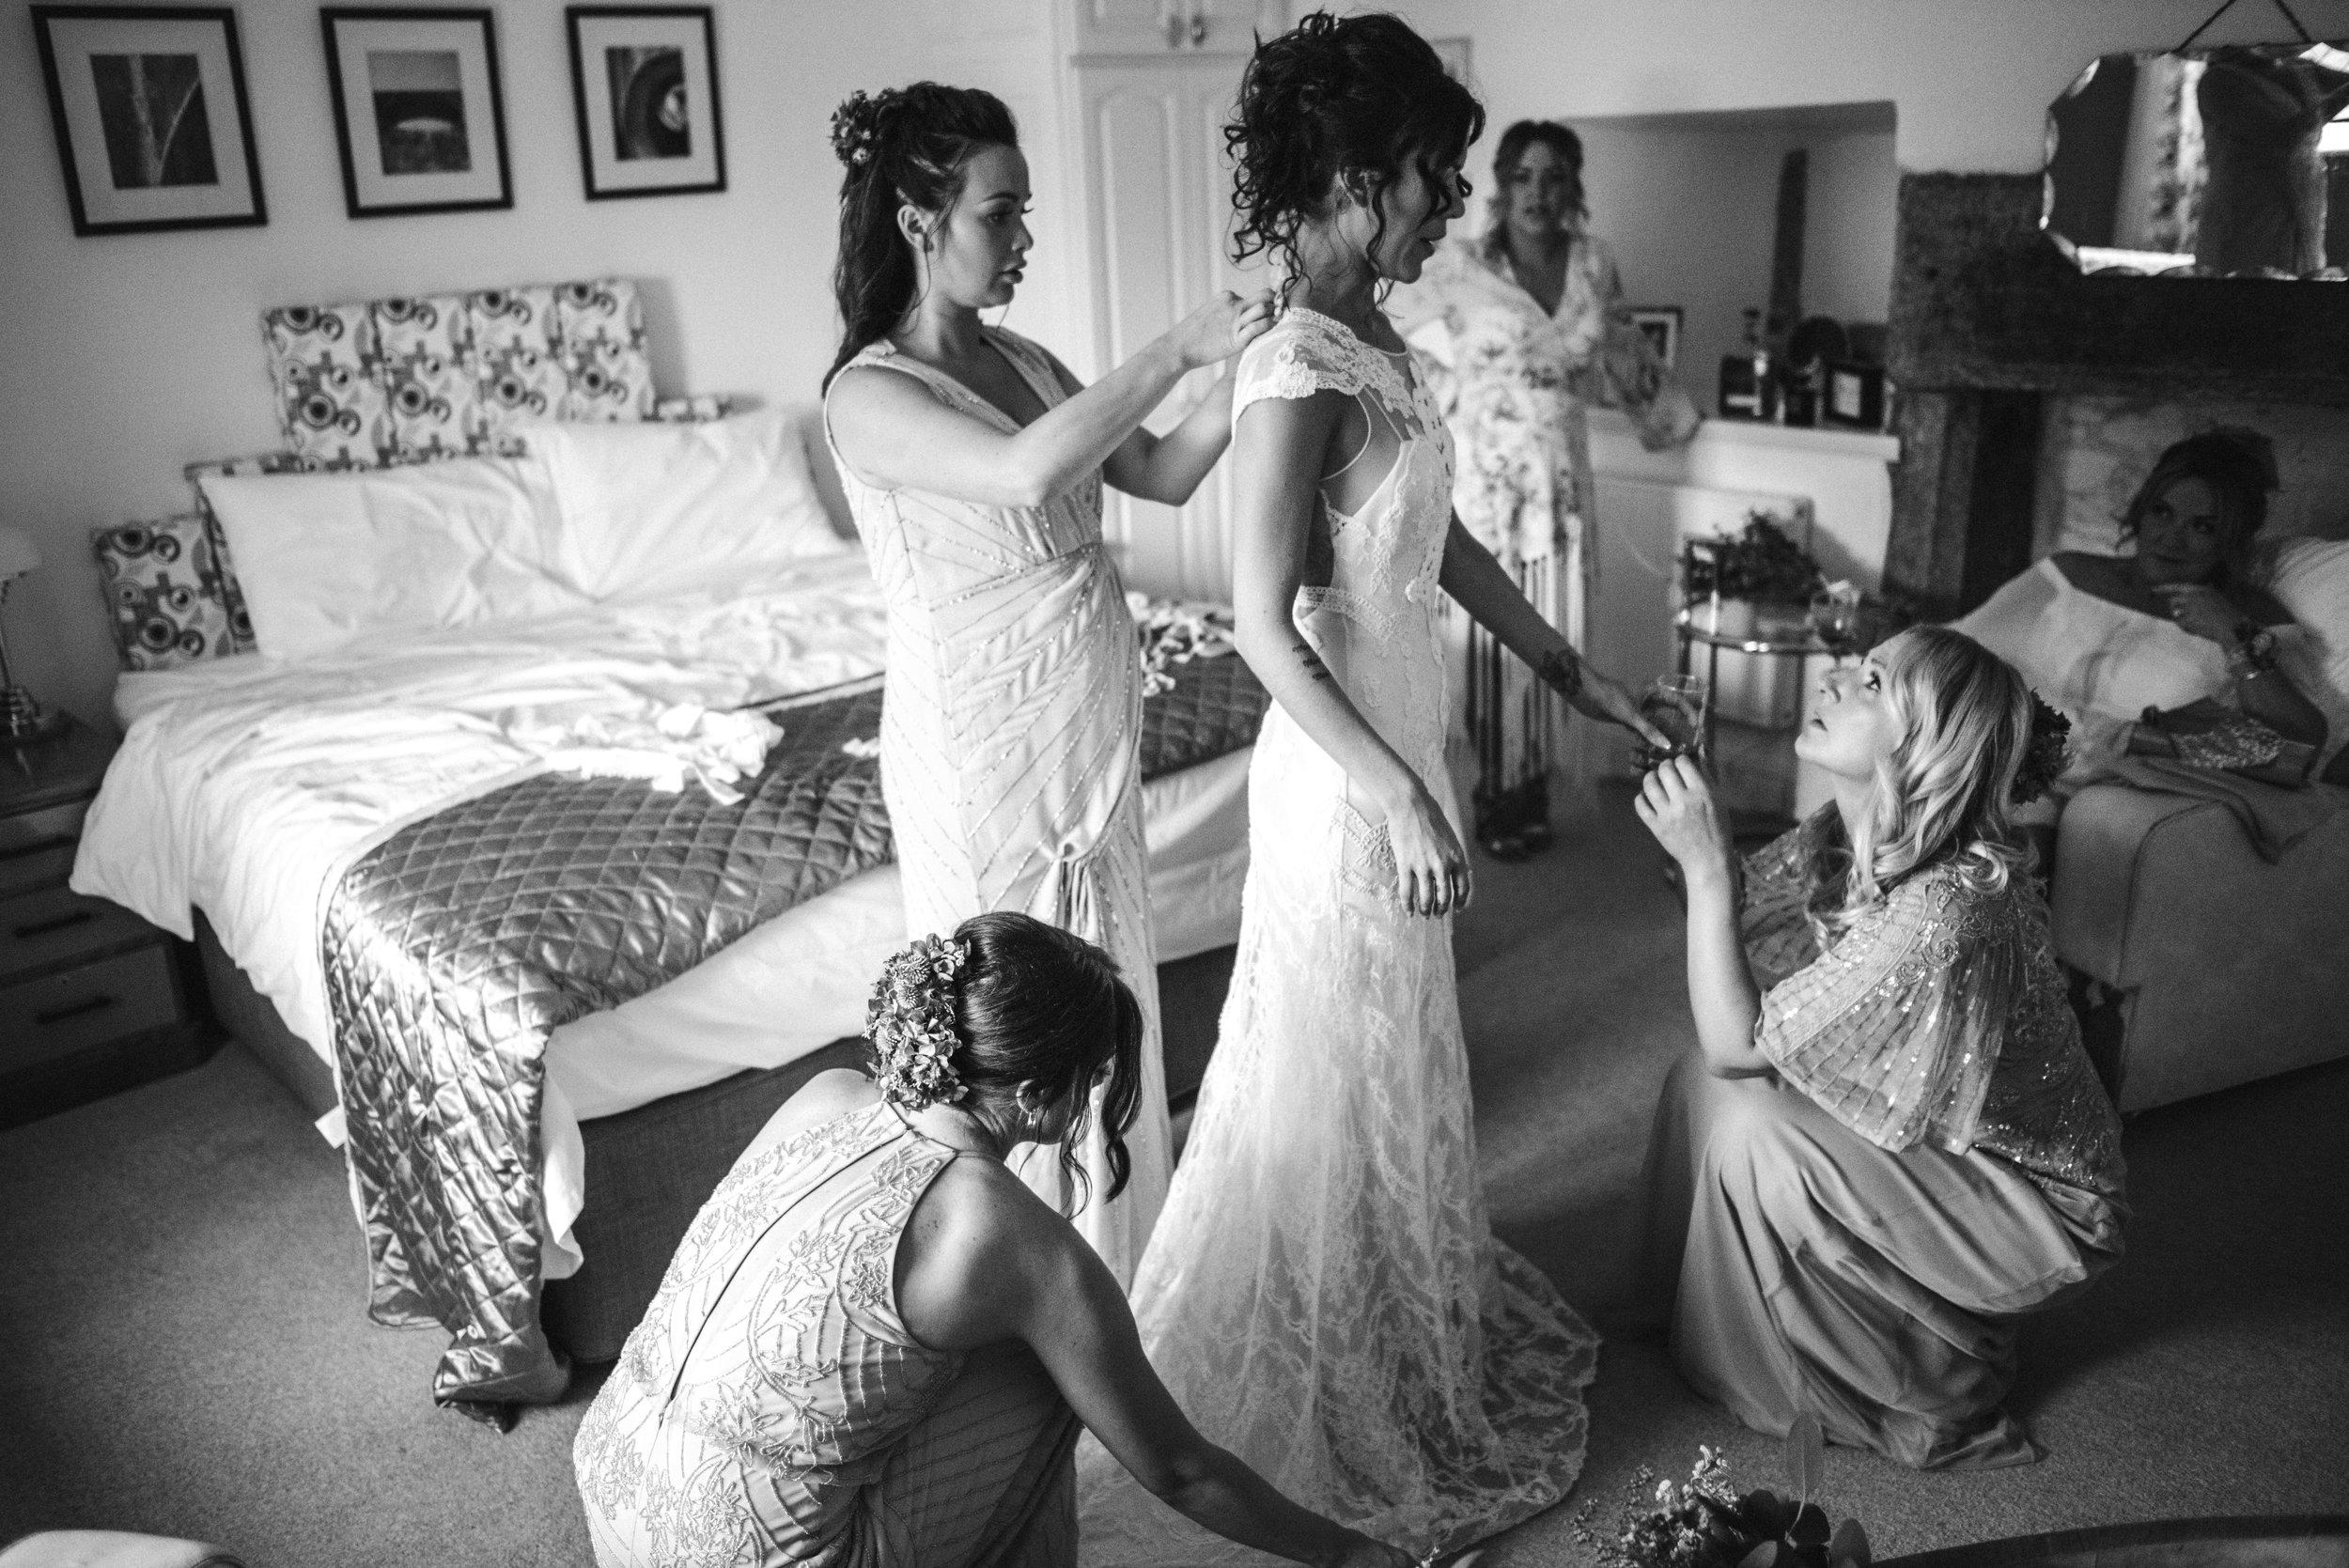 pengenna-manor-wedding-photographer-20.jpg